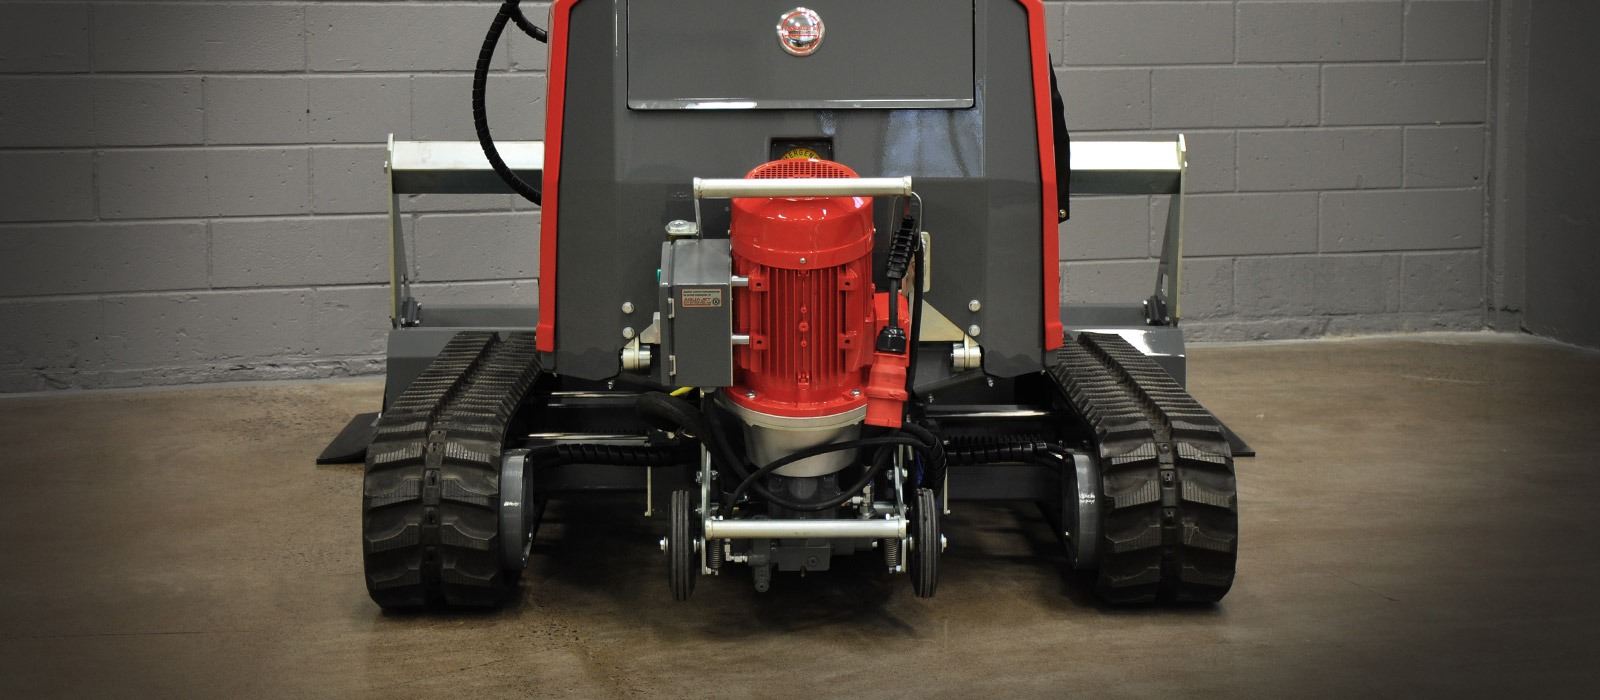 Hybrid Kit Hydrodemoliton Robot Accessory